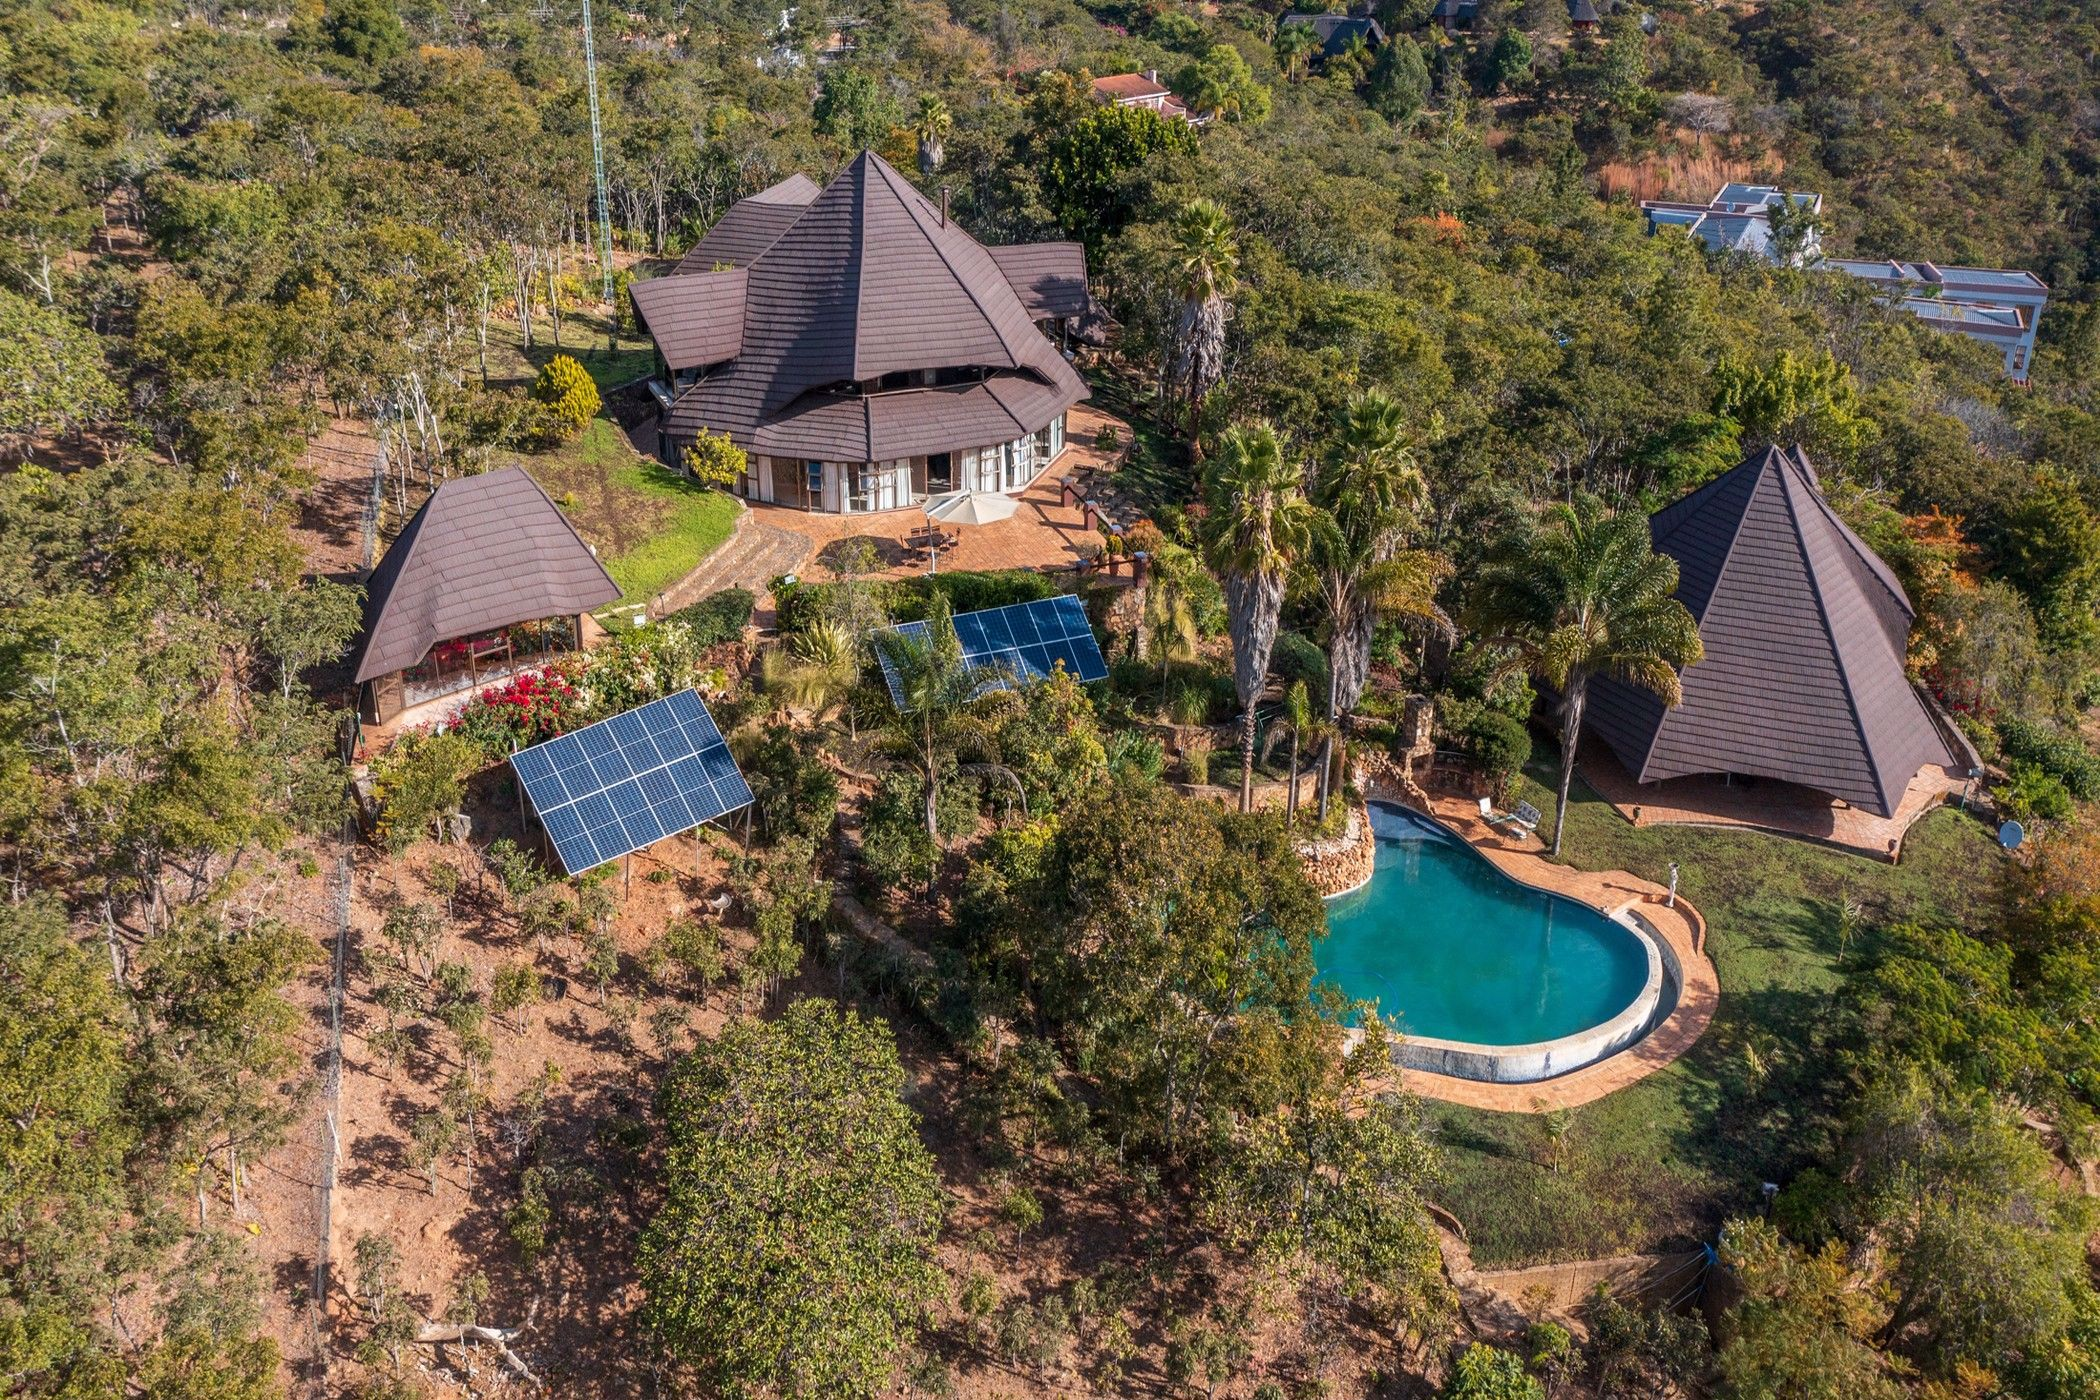 5 bedroom house for sale in Helensvale (Zimbabwe)